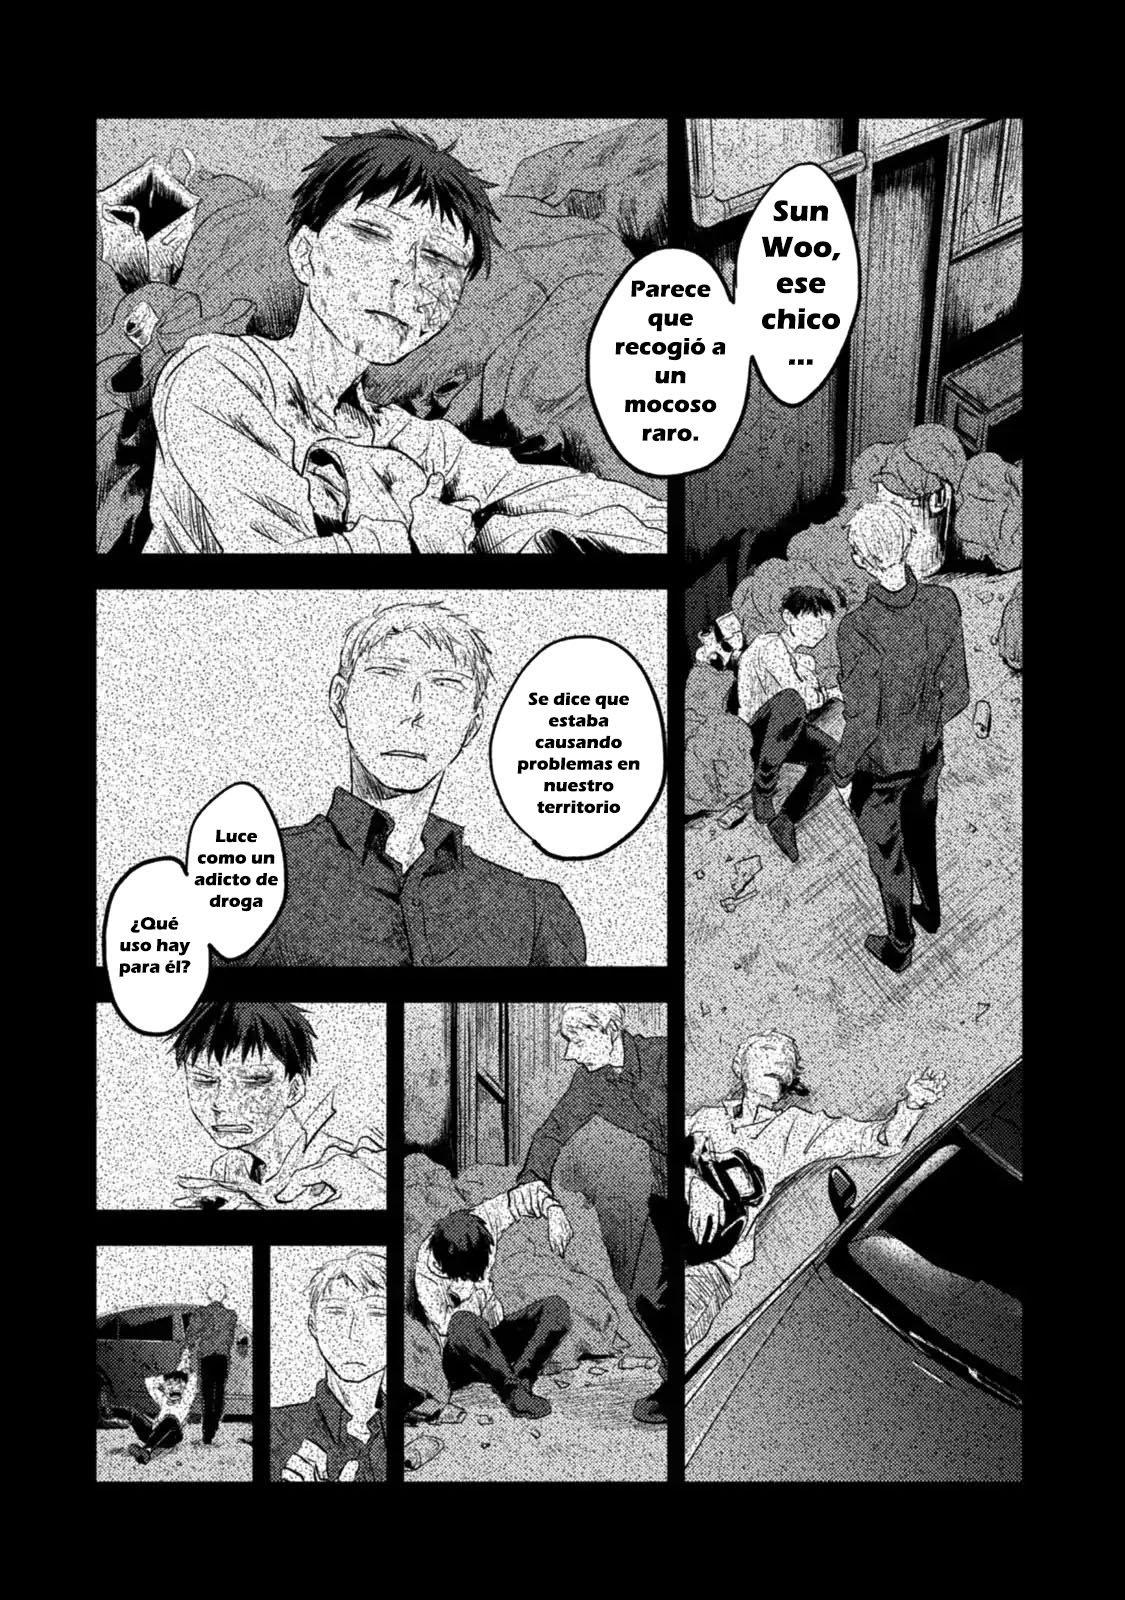 https://c9.mangatag.com/es_manga/pic5/14/21518/730317/3846f5ae211da371800d278073470dd0.jpg Page 10